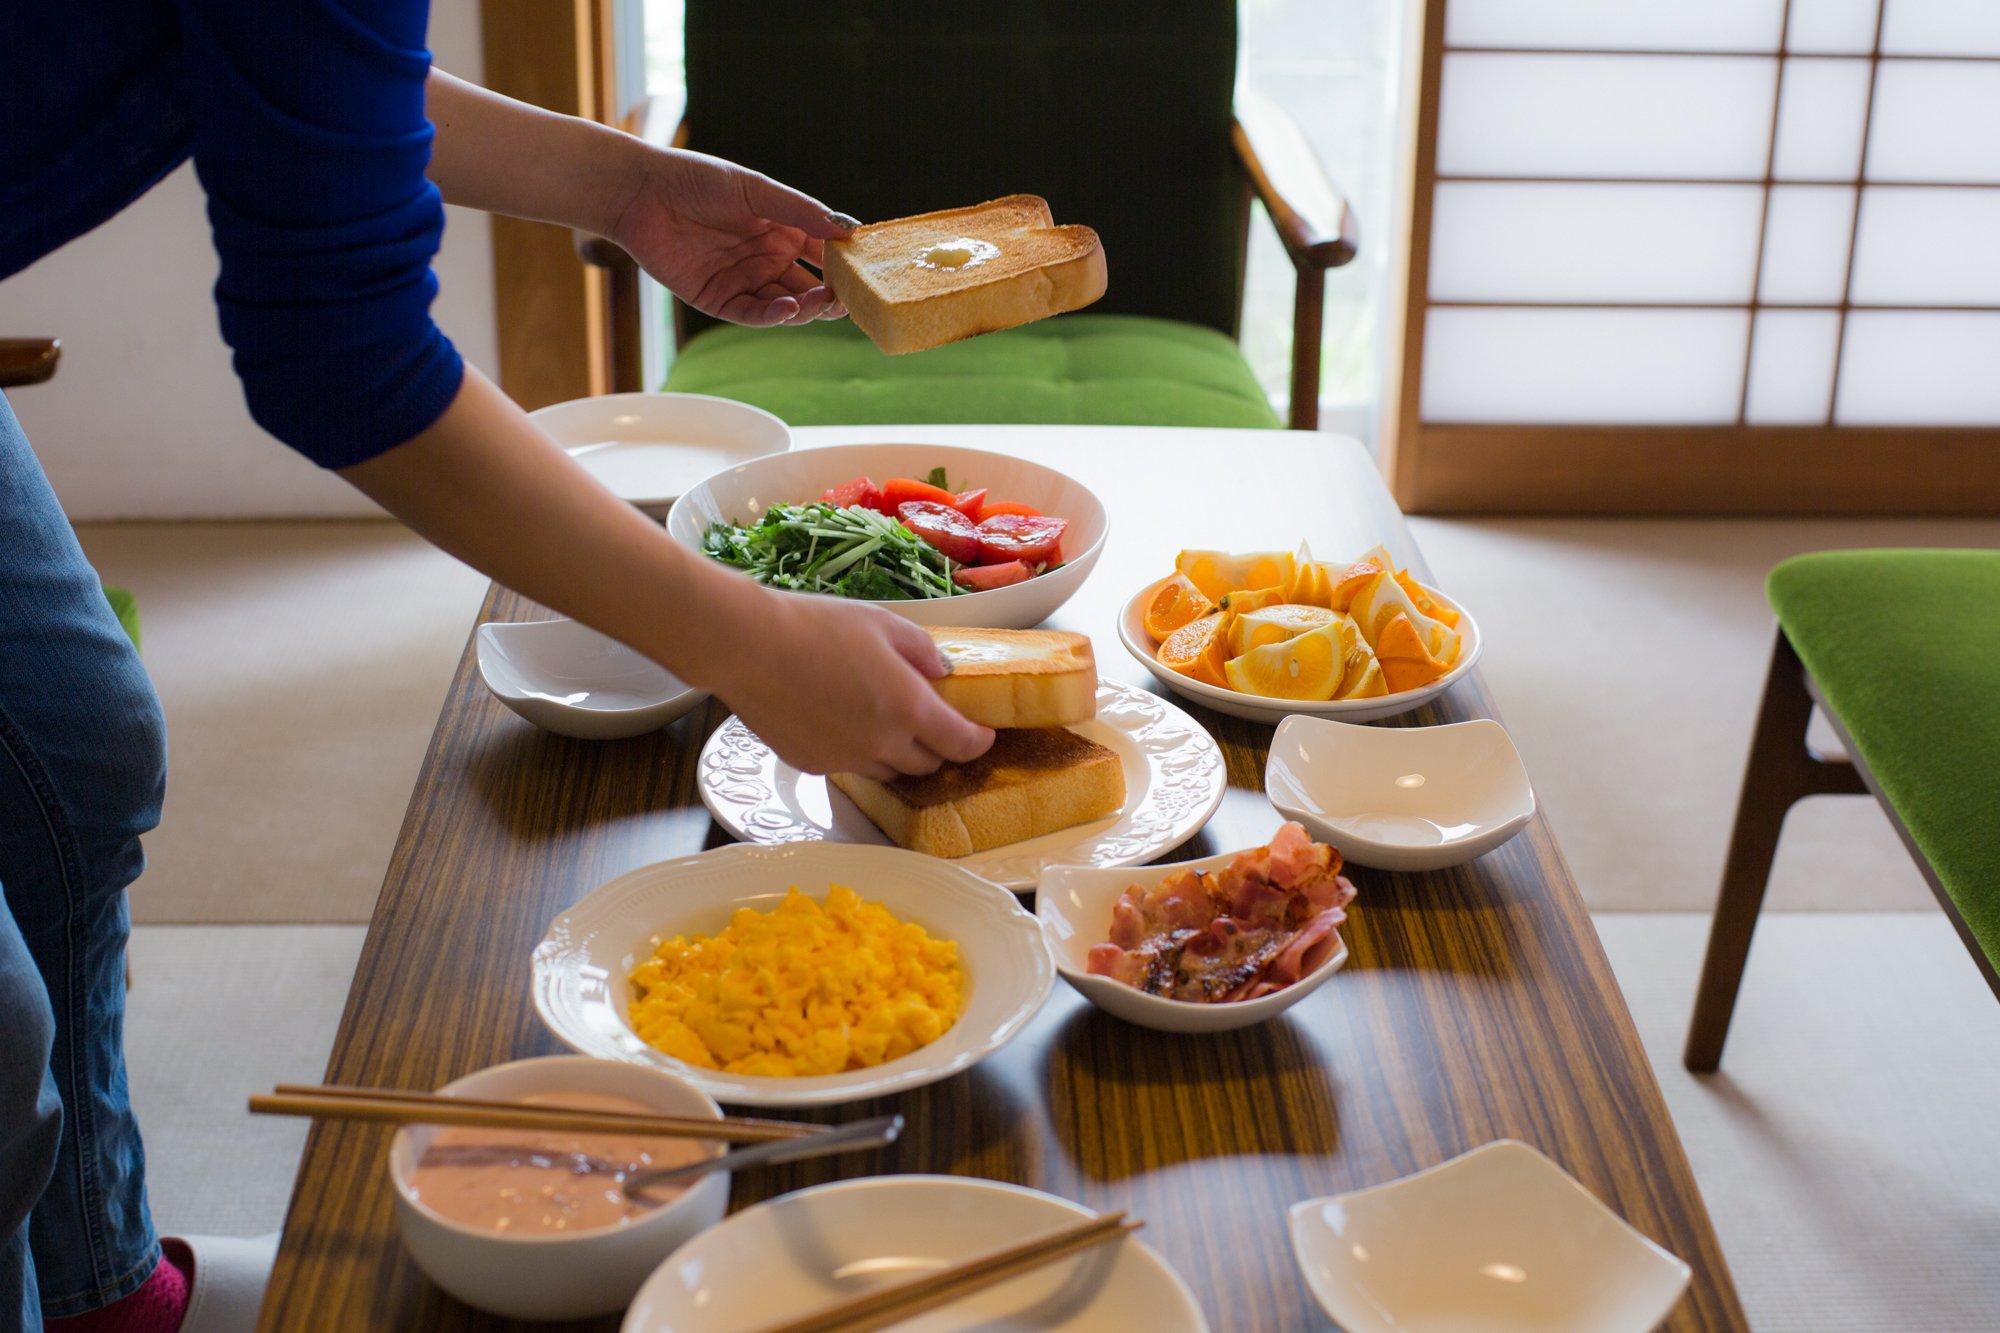 haletto house KOSHIGOEで食事している様子